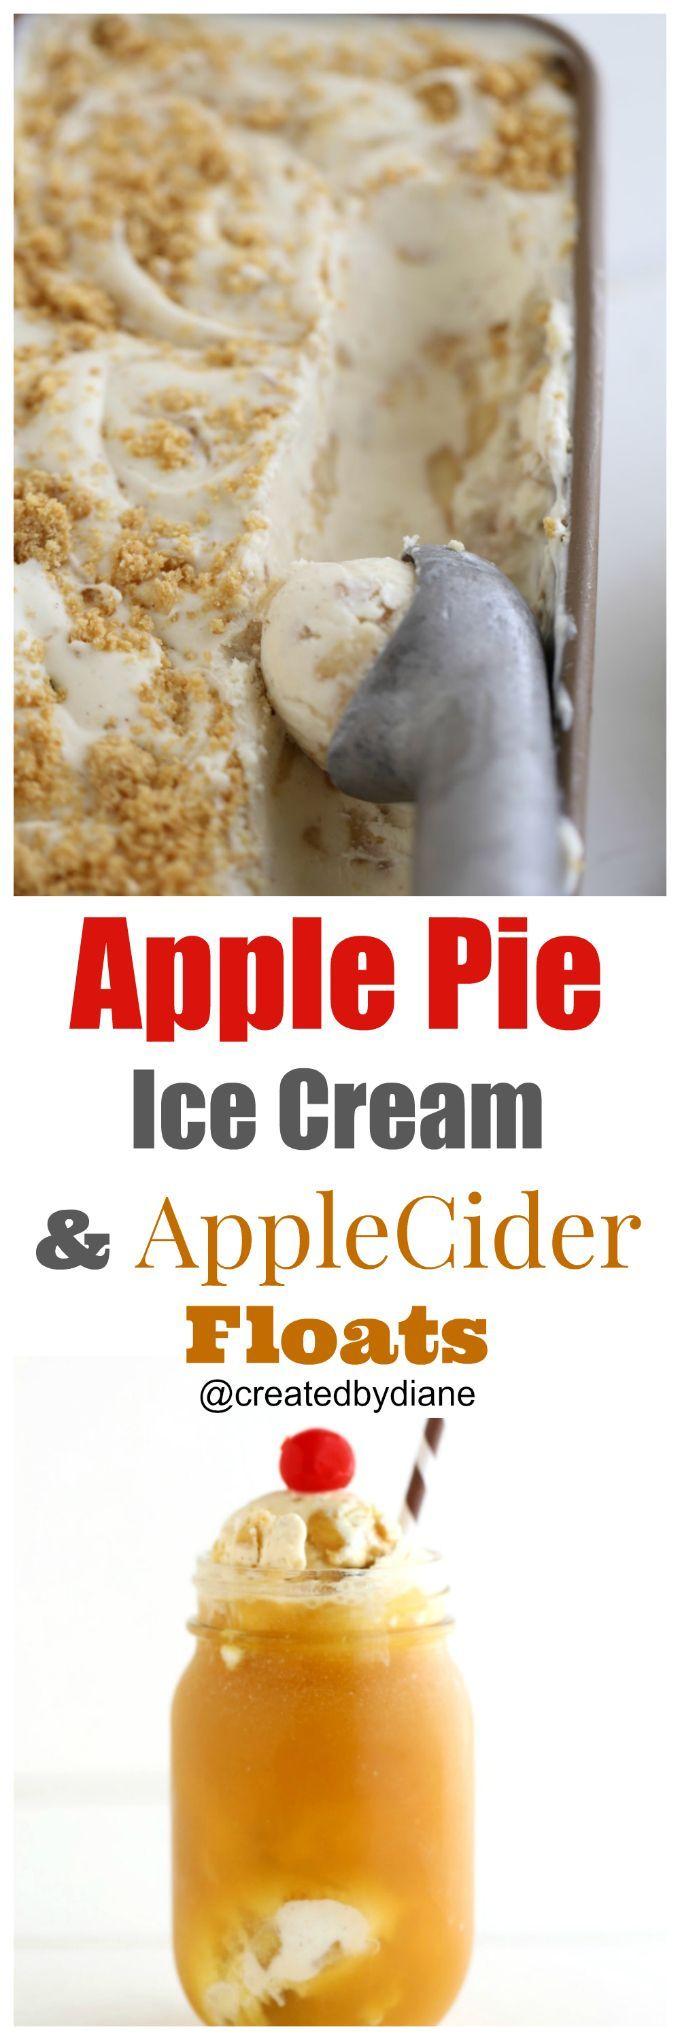 apple-pie-ice-cream-recipe-with-apple-cider-floats-createdbydiane